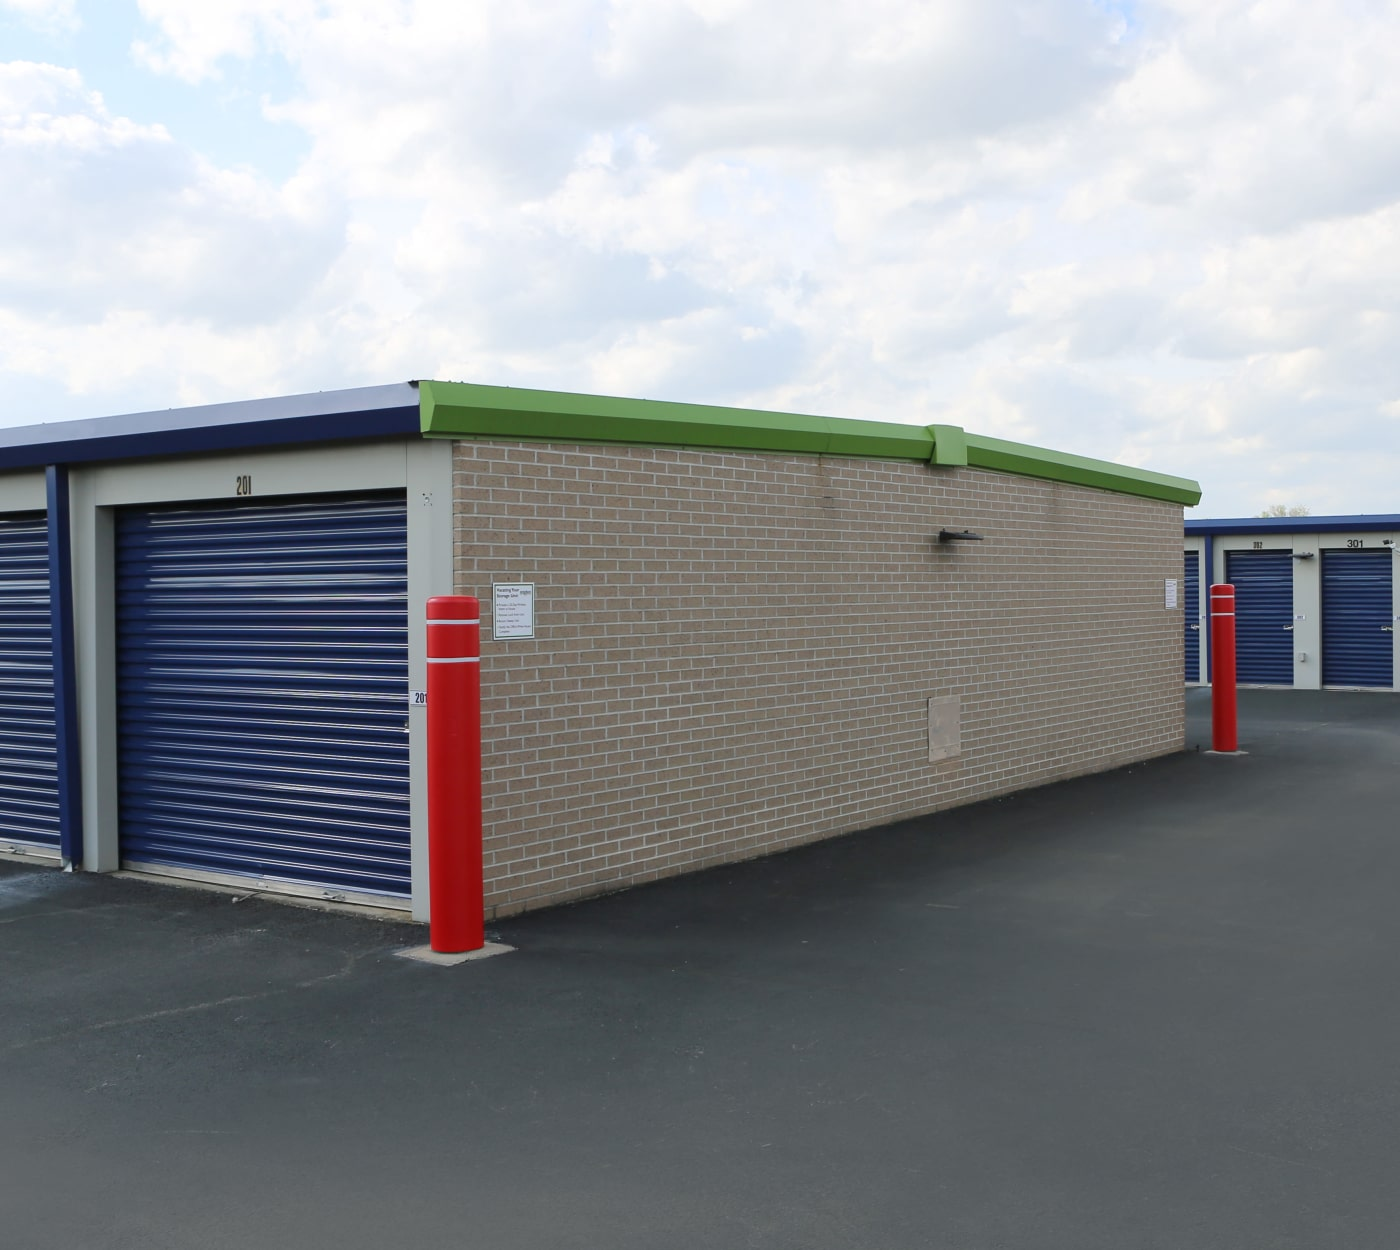 Exterior storage units at Midgard Self Storage in Sheffield, Alabama